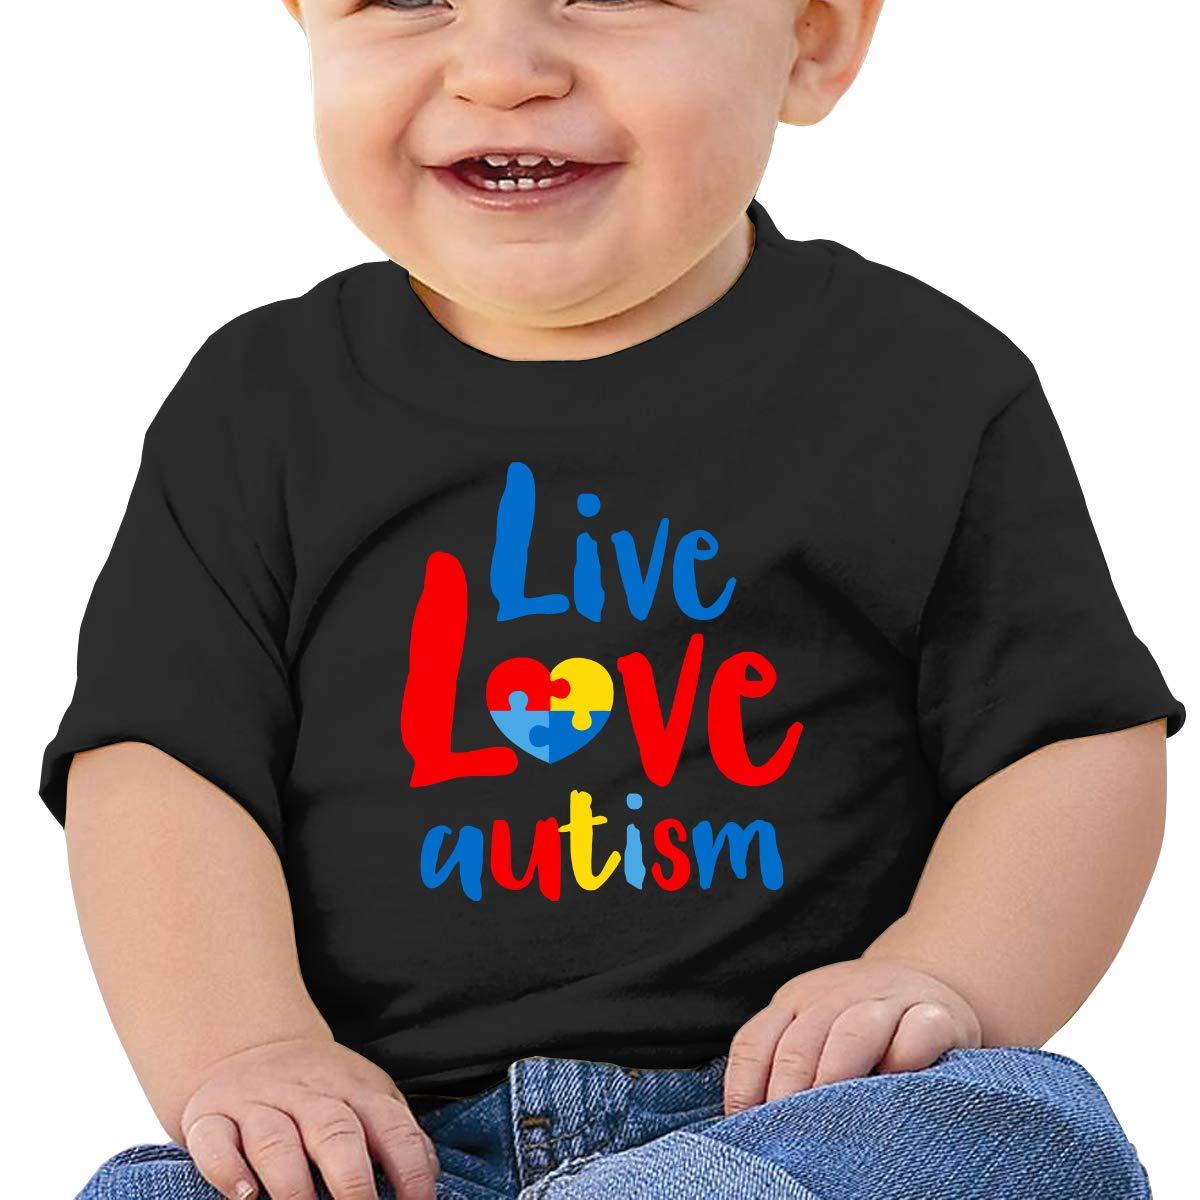 Live Love Autism Baby Boys Girls Short Sleeve Crew Neck T-Shirt 6-18 Month Tops